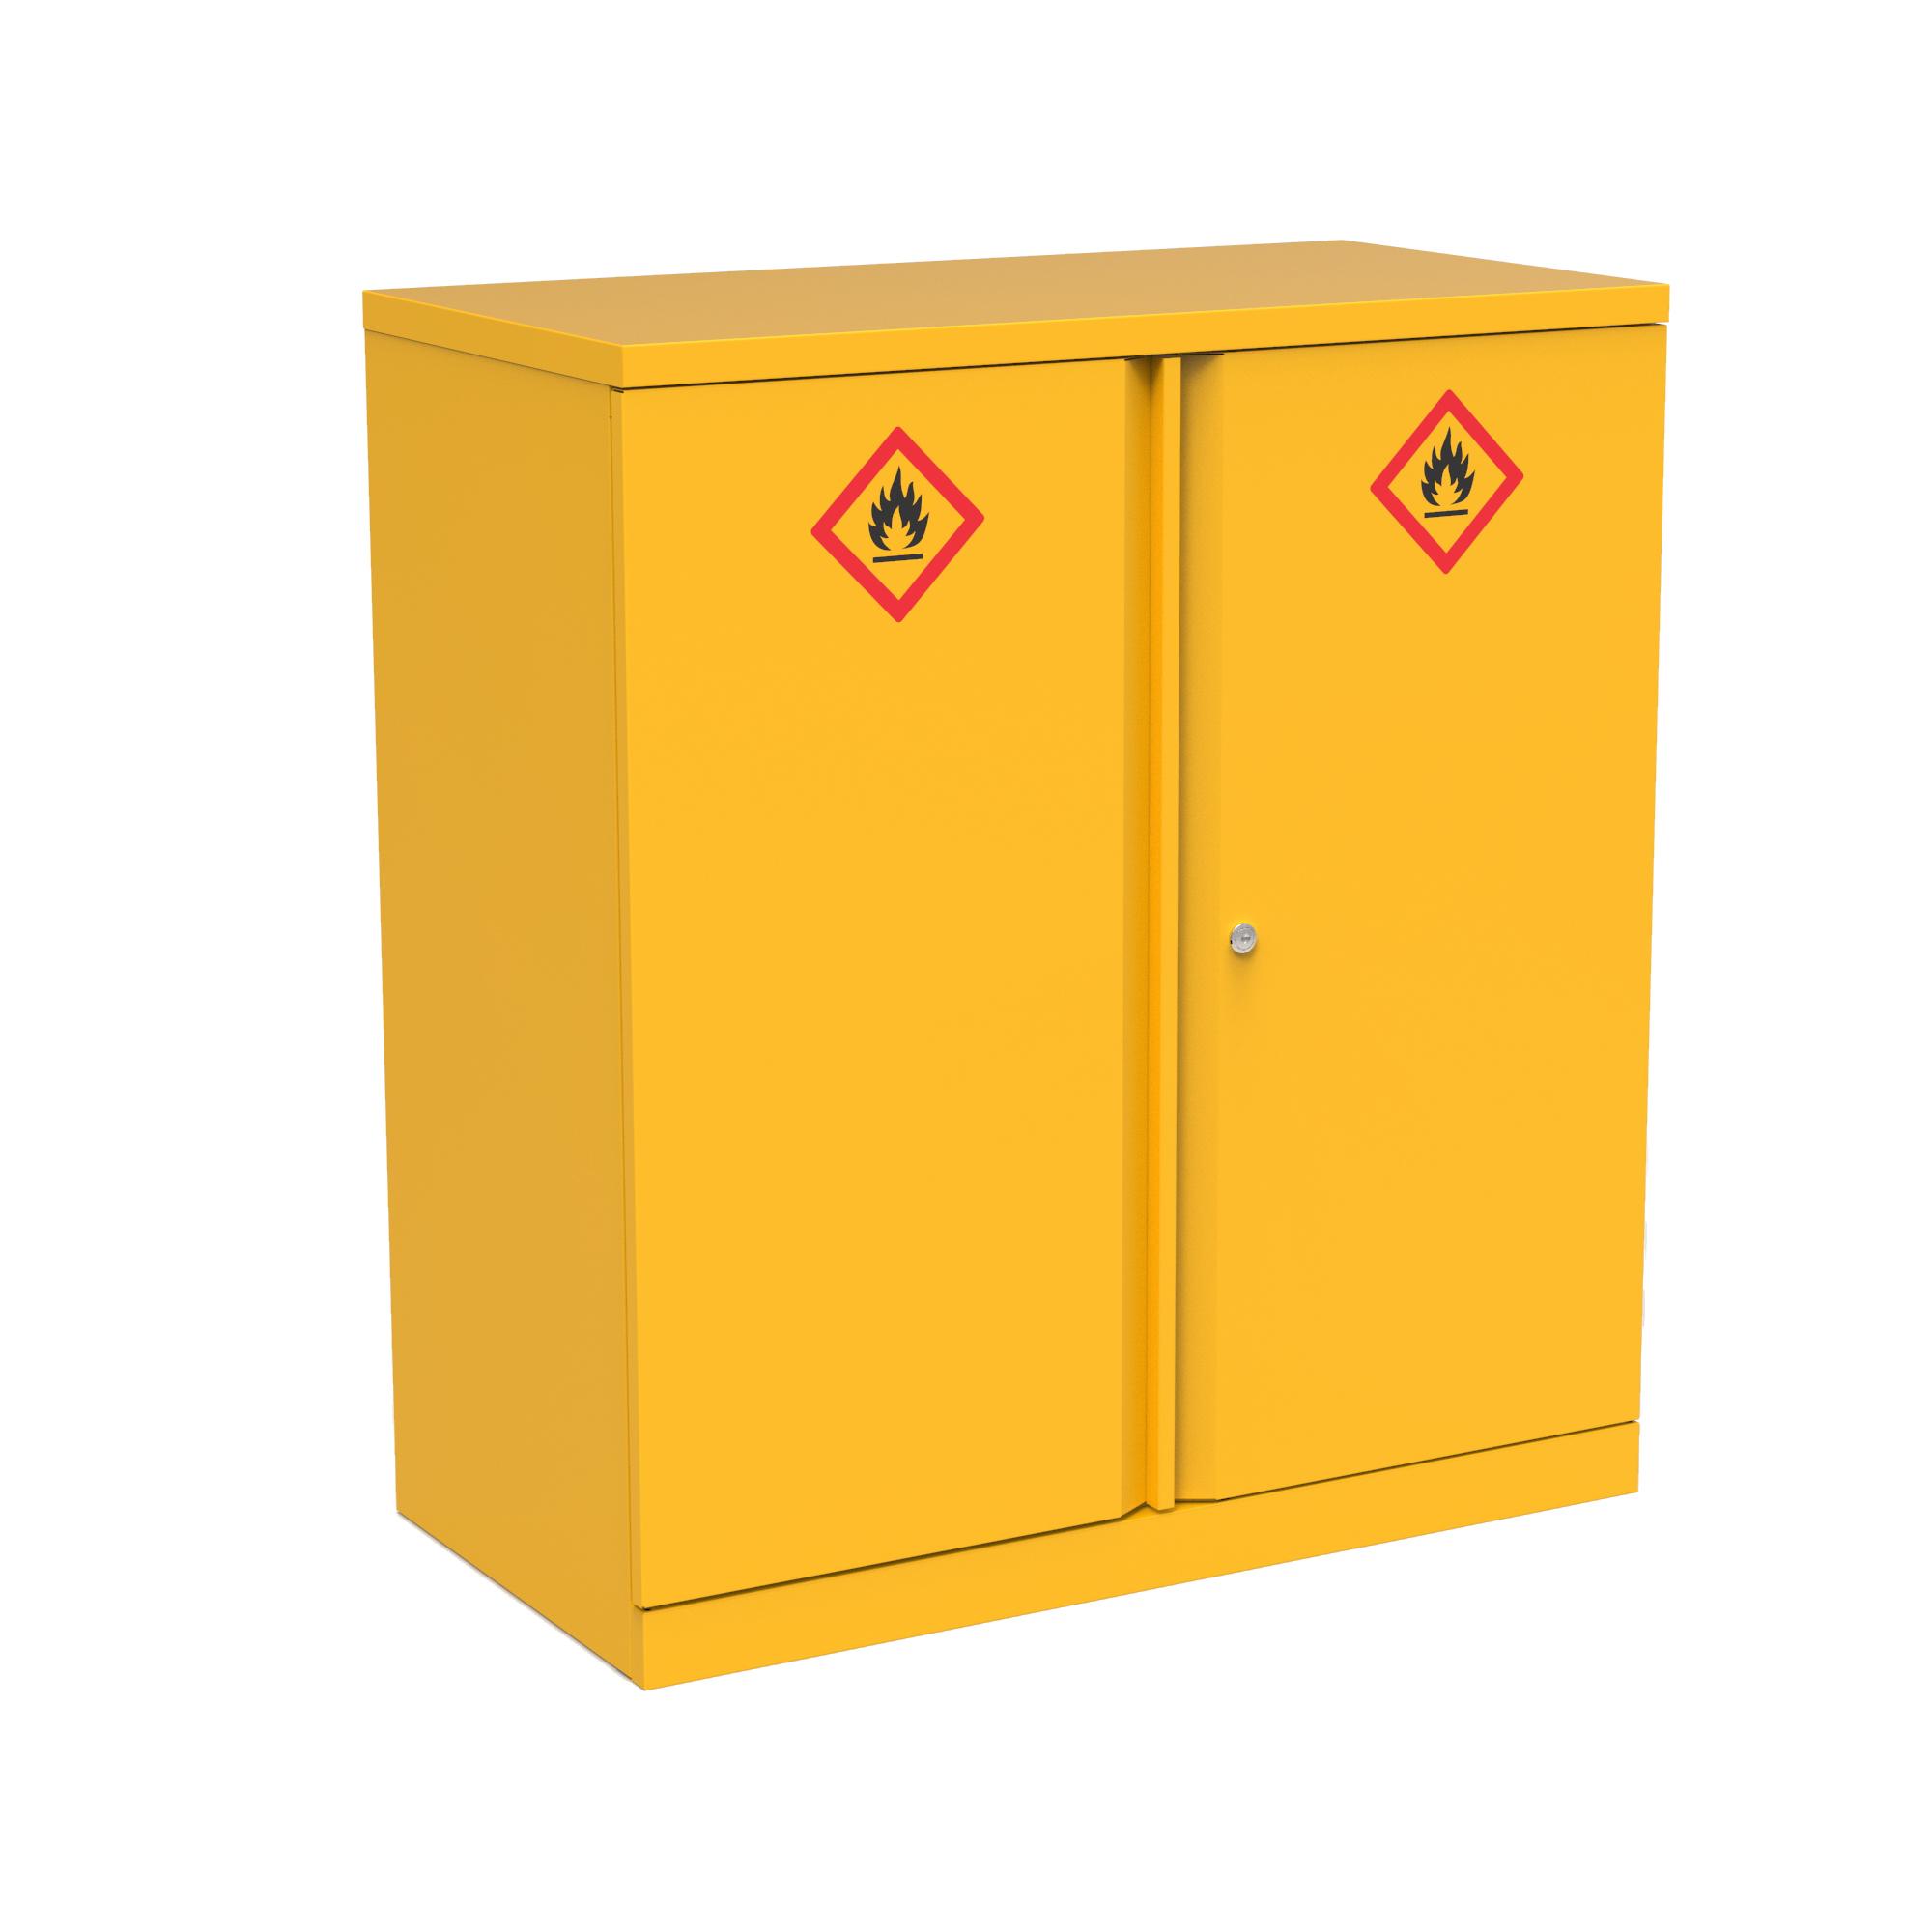 Domestic cupboard Bisley Hazardous Substances Cabinet 1 Shelf 914x470x1000 Ref PC 158958